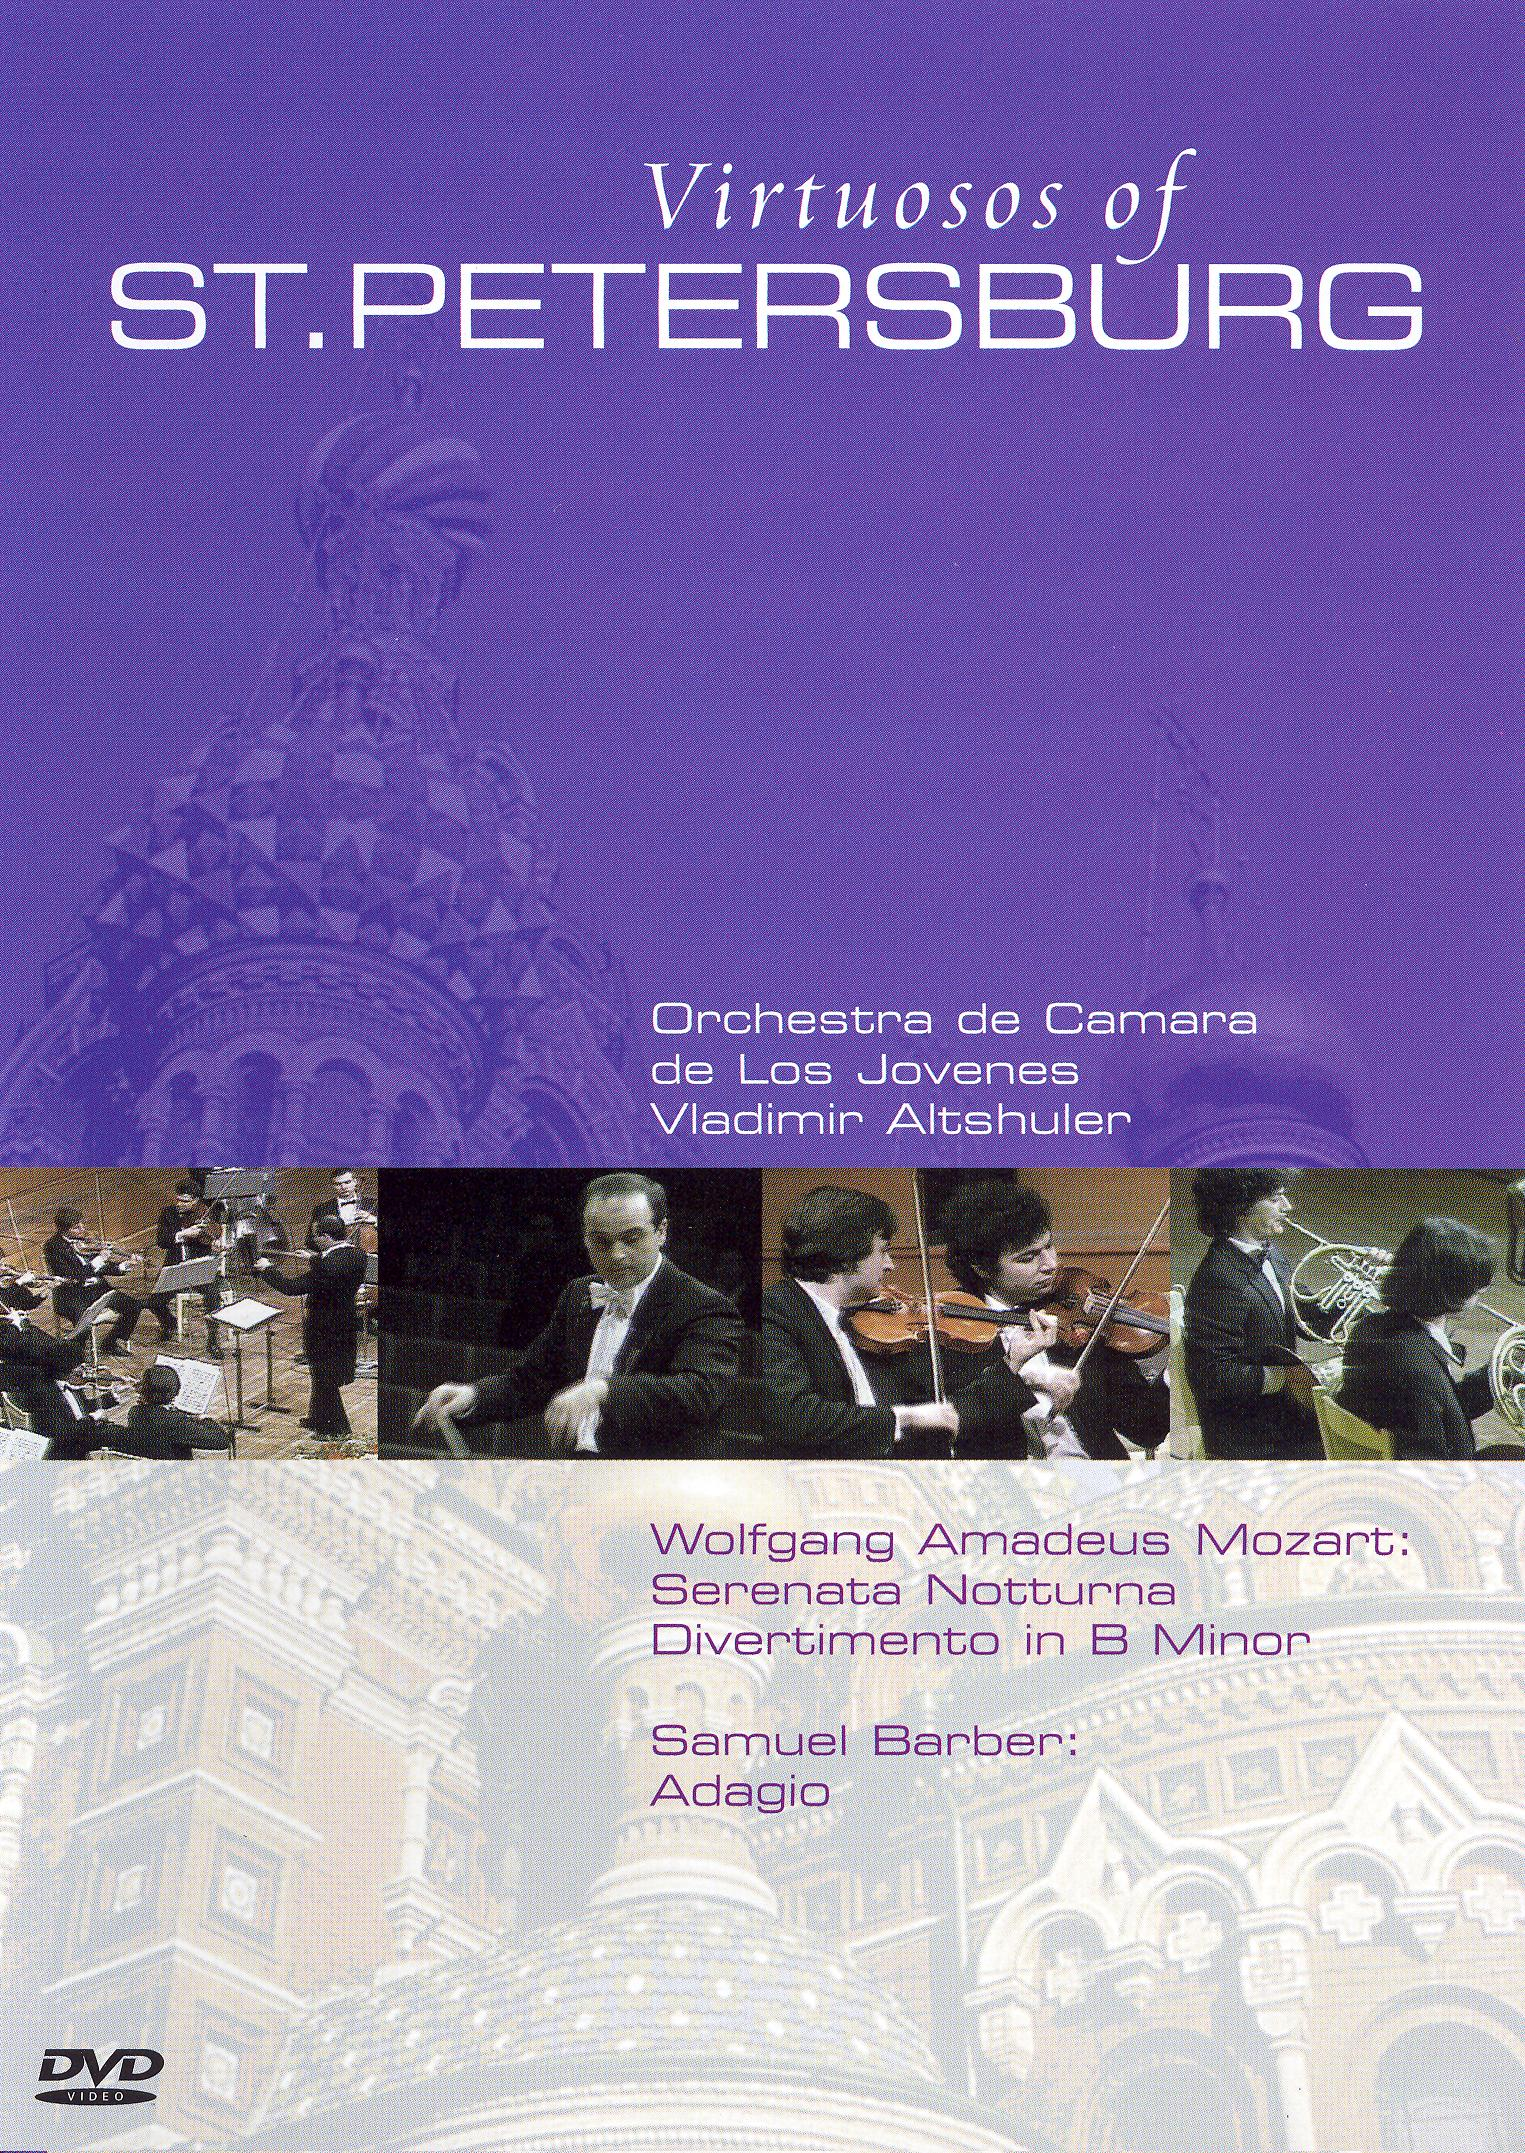 Virtuosos of St. Petersburg